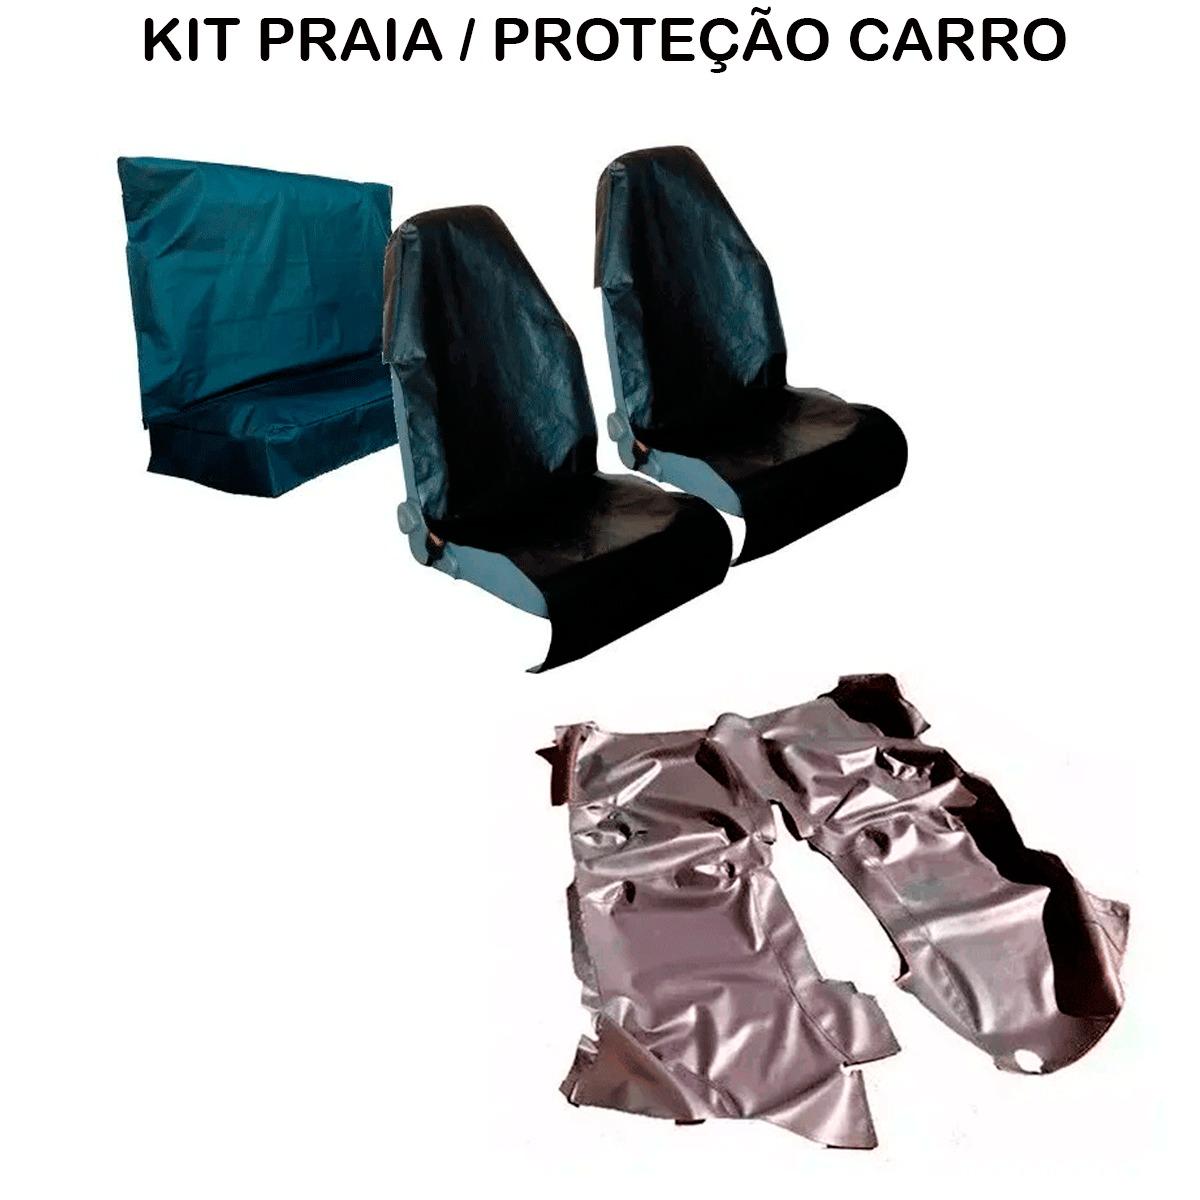 Tapete Em Vinil Ford Corcel todos + Capa Banco Protecao Banco Areia Suor Academia